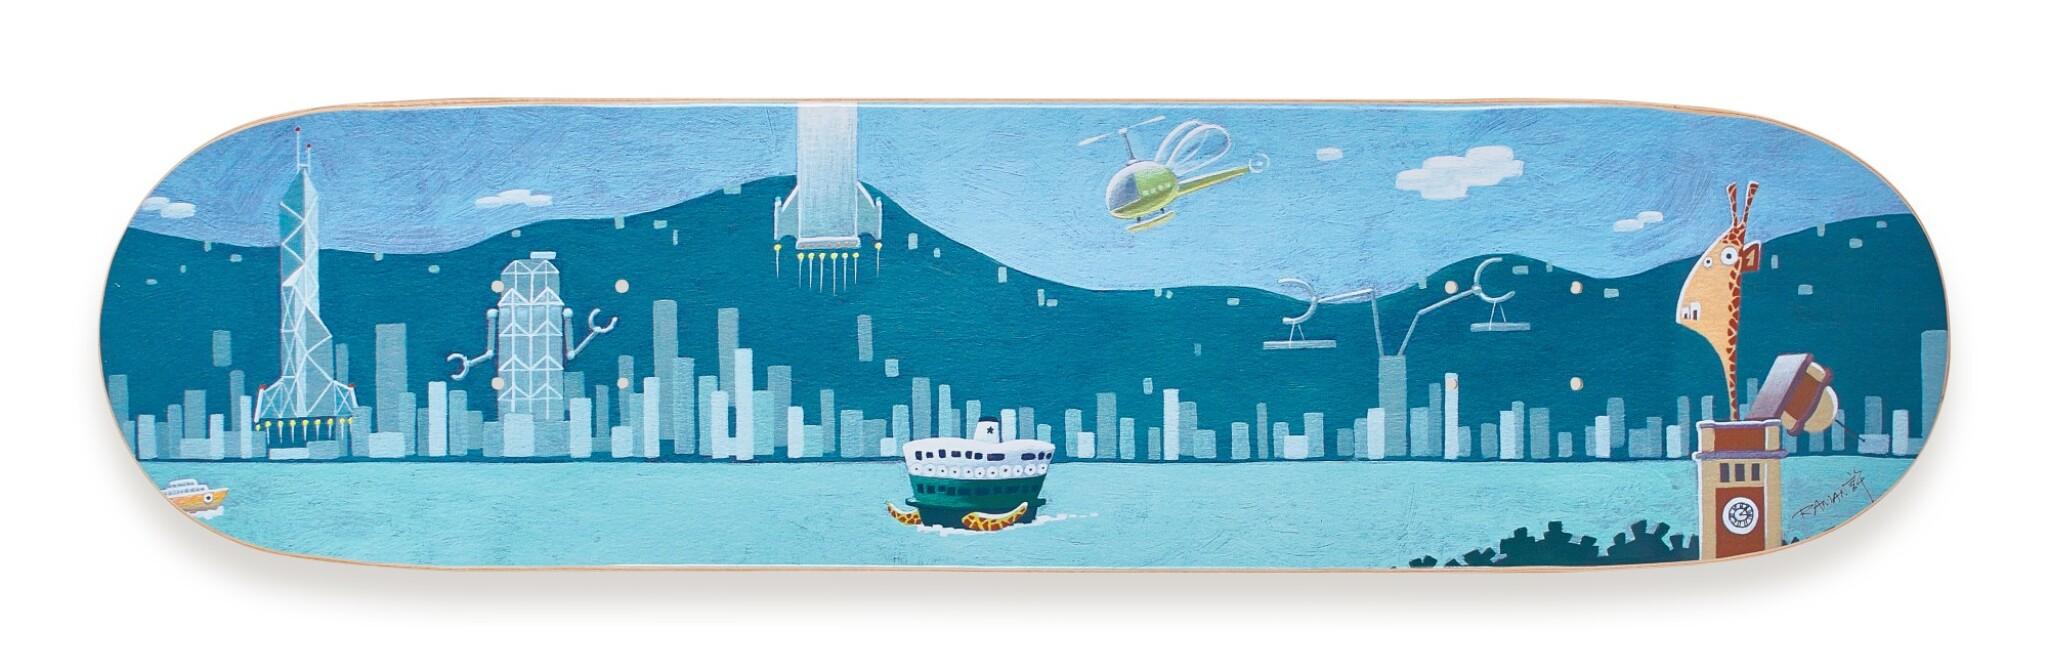 RAMAN HUI 許誠毅   HONG KONG: THE PLAYGROUND 香港樂園